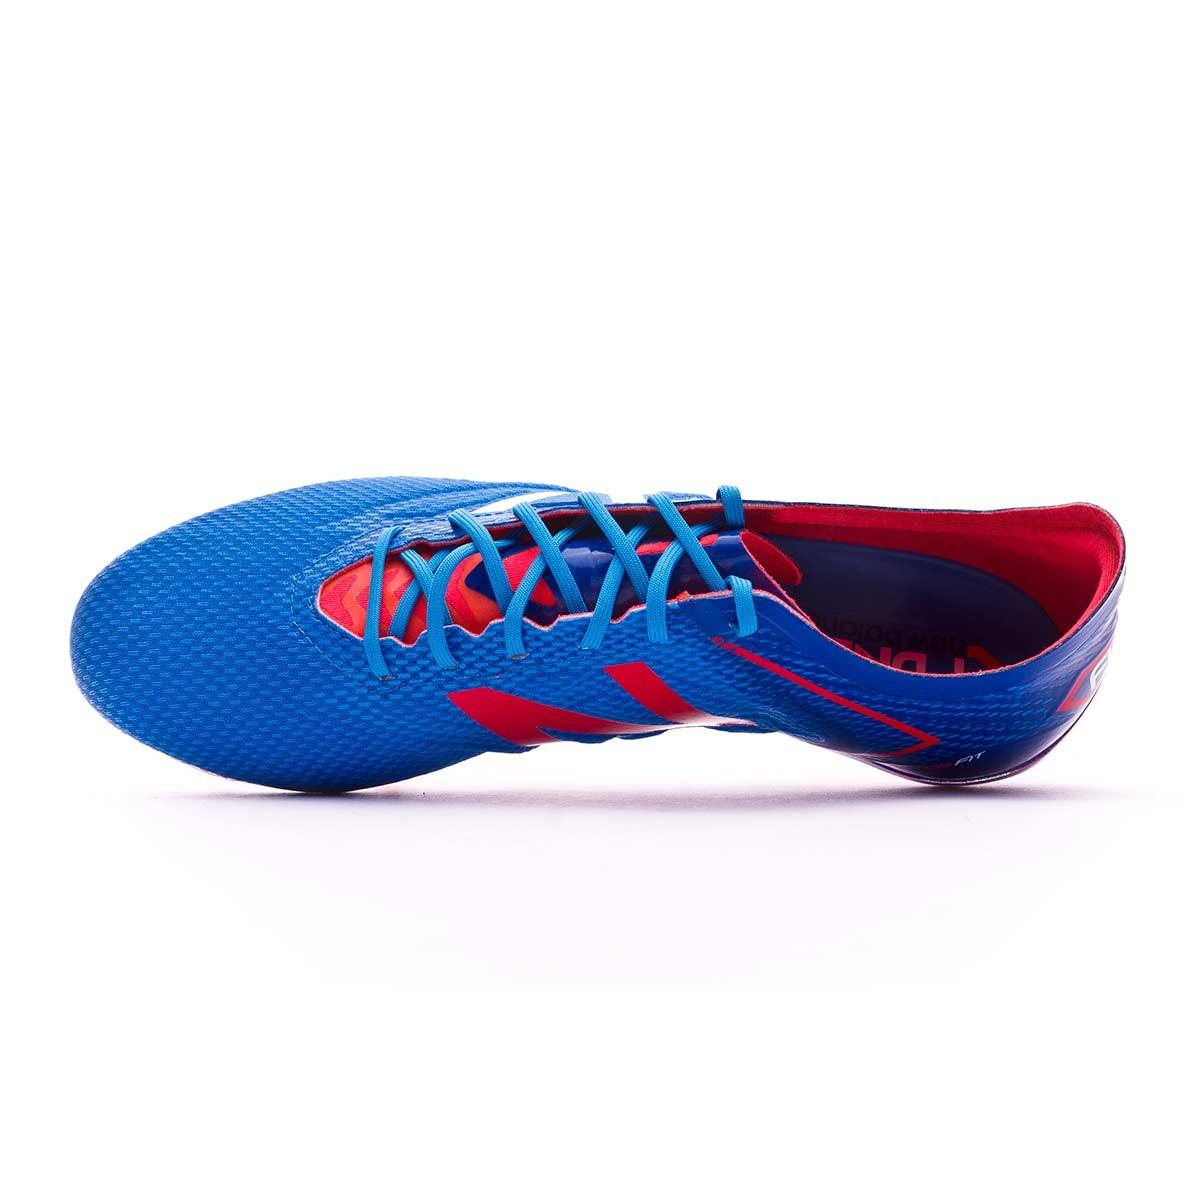 Bota Furon 3.0 Pro FG Bolt-Team royal Talla 11 USA NNaoa